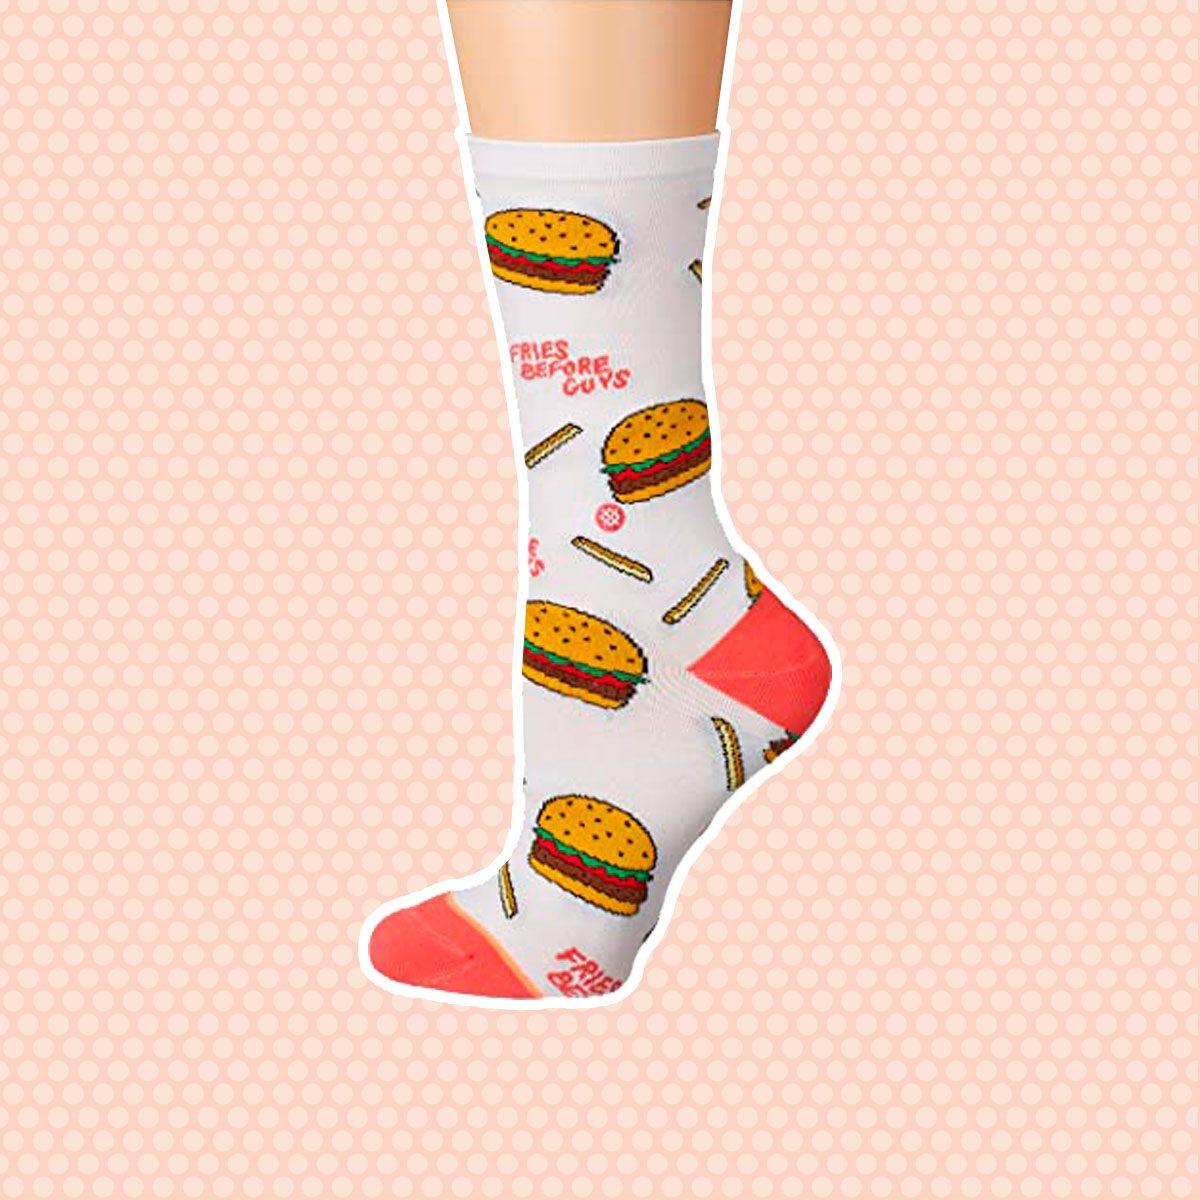 Fries B4 Guys Crew Socks